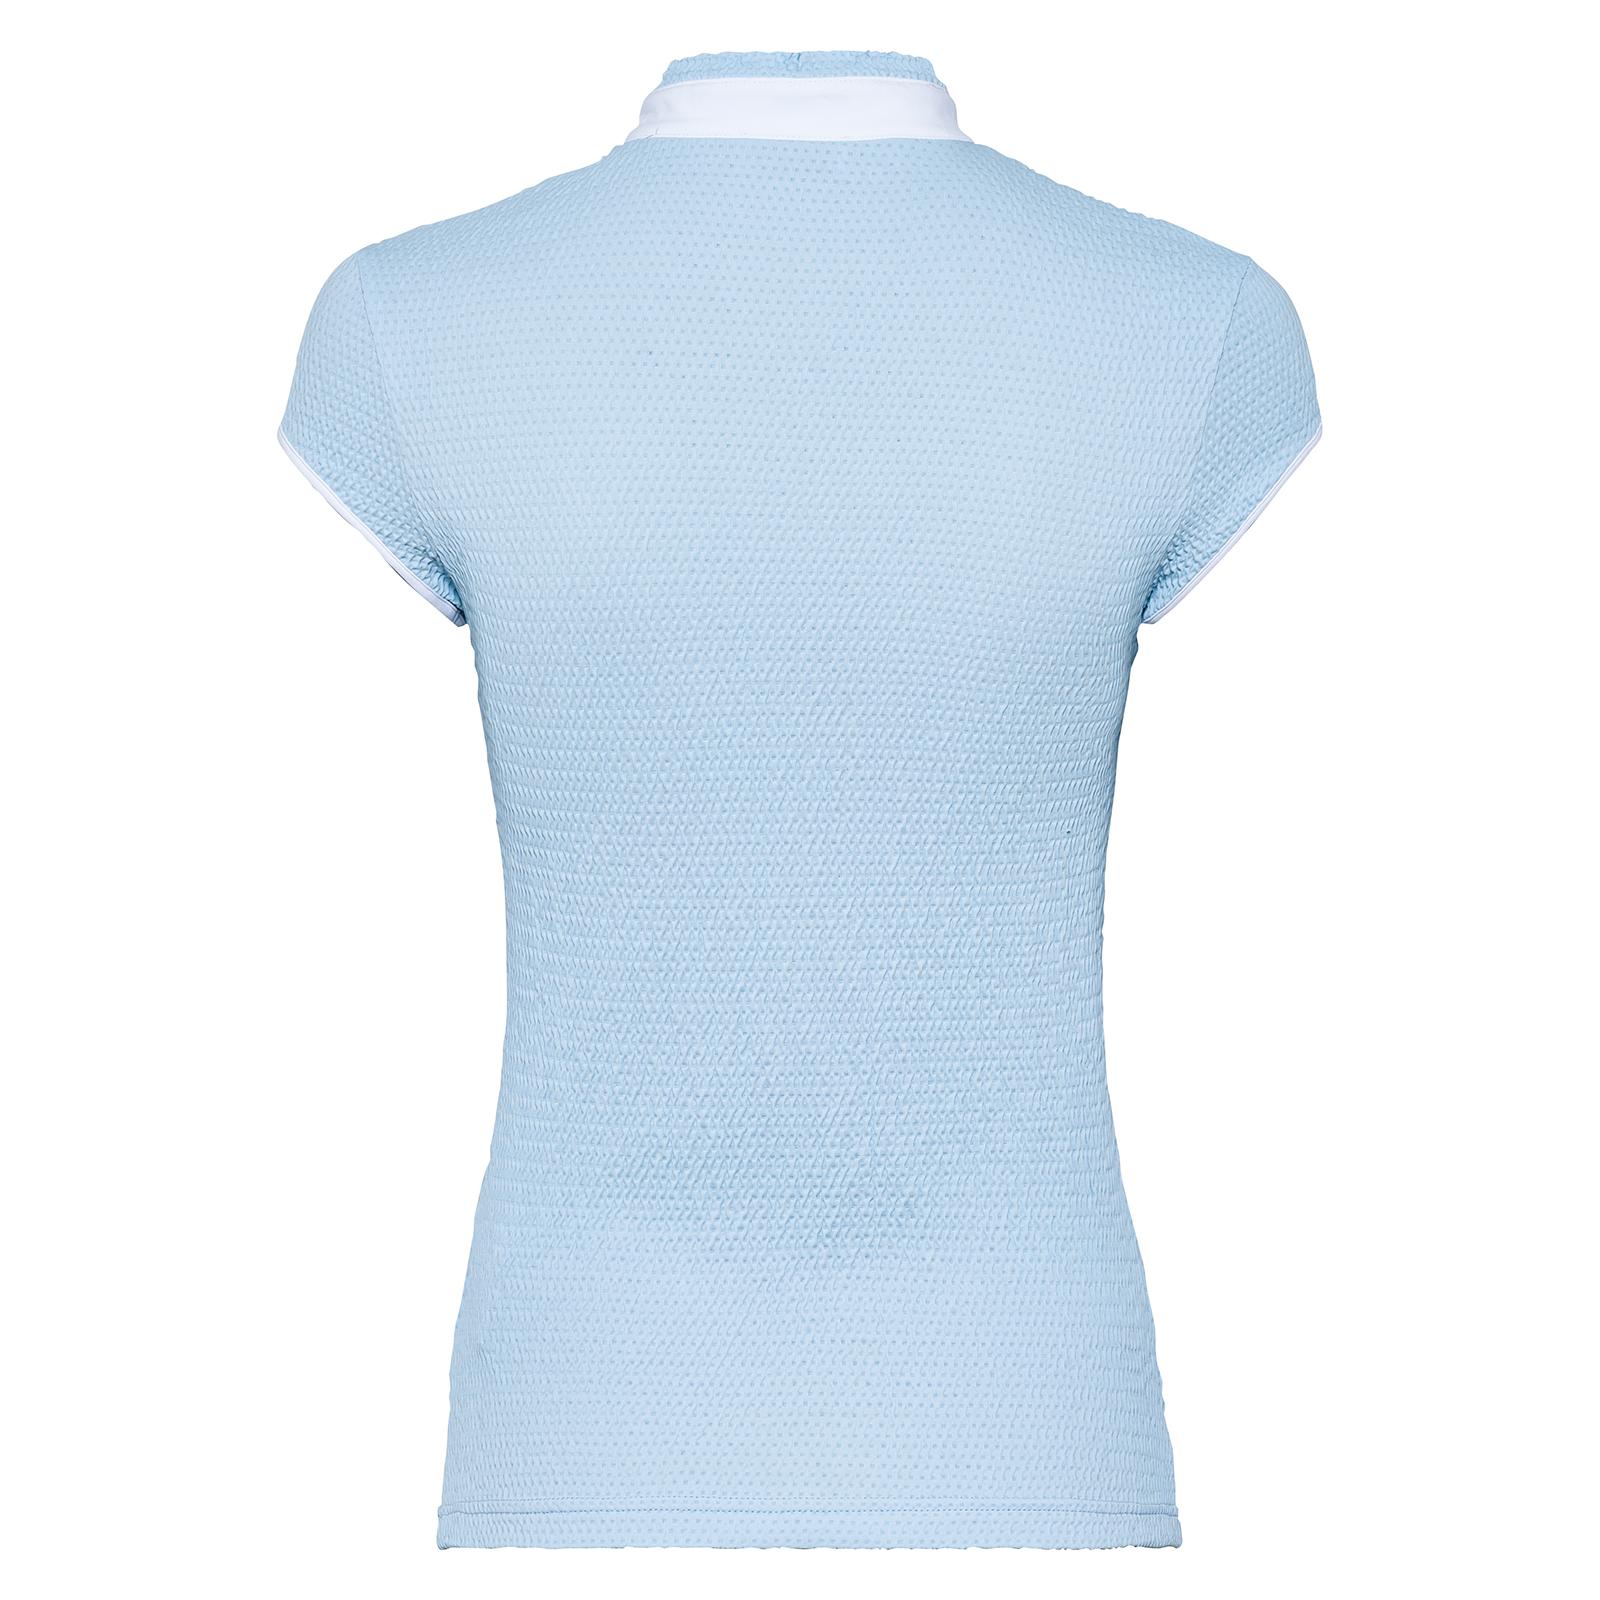 Komfortables Damen Shirt mit Dry Comfort-Effekt